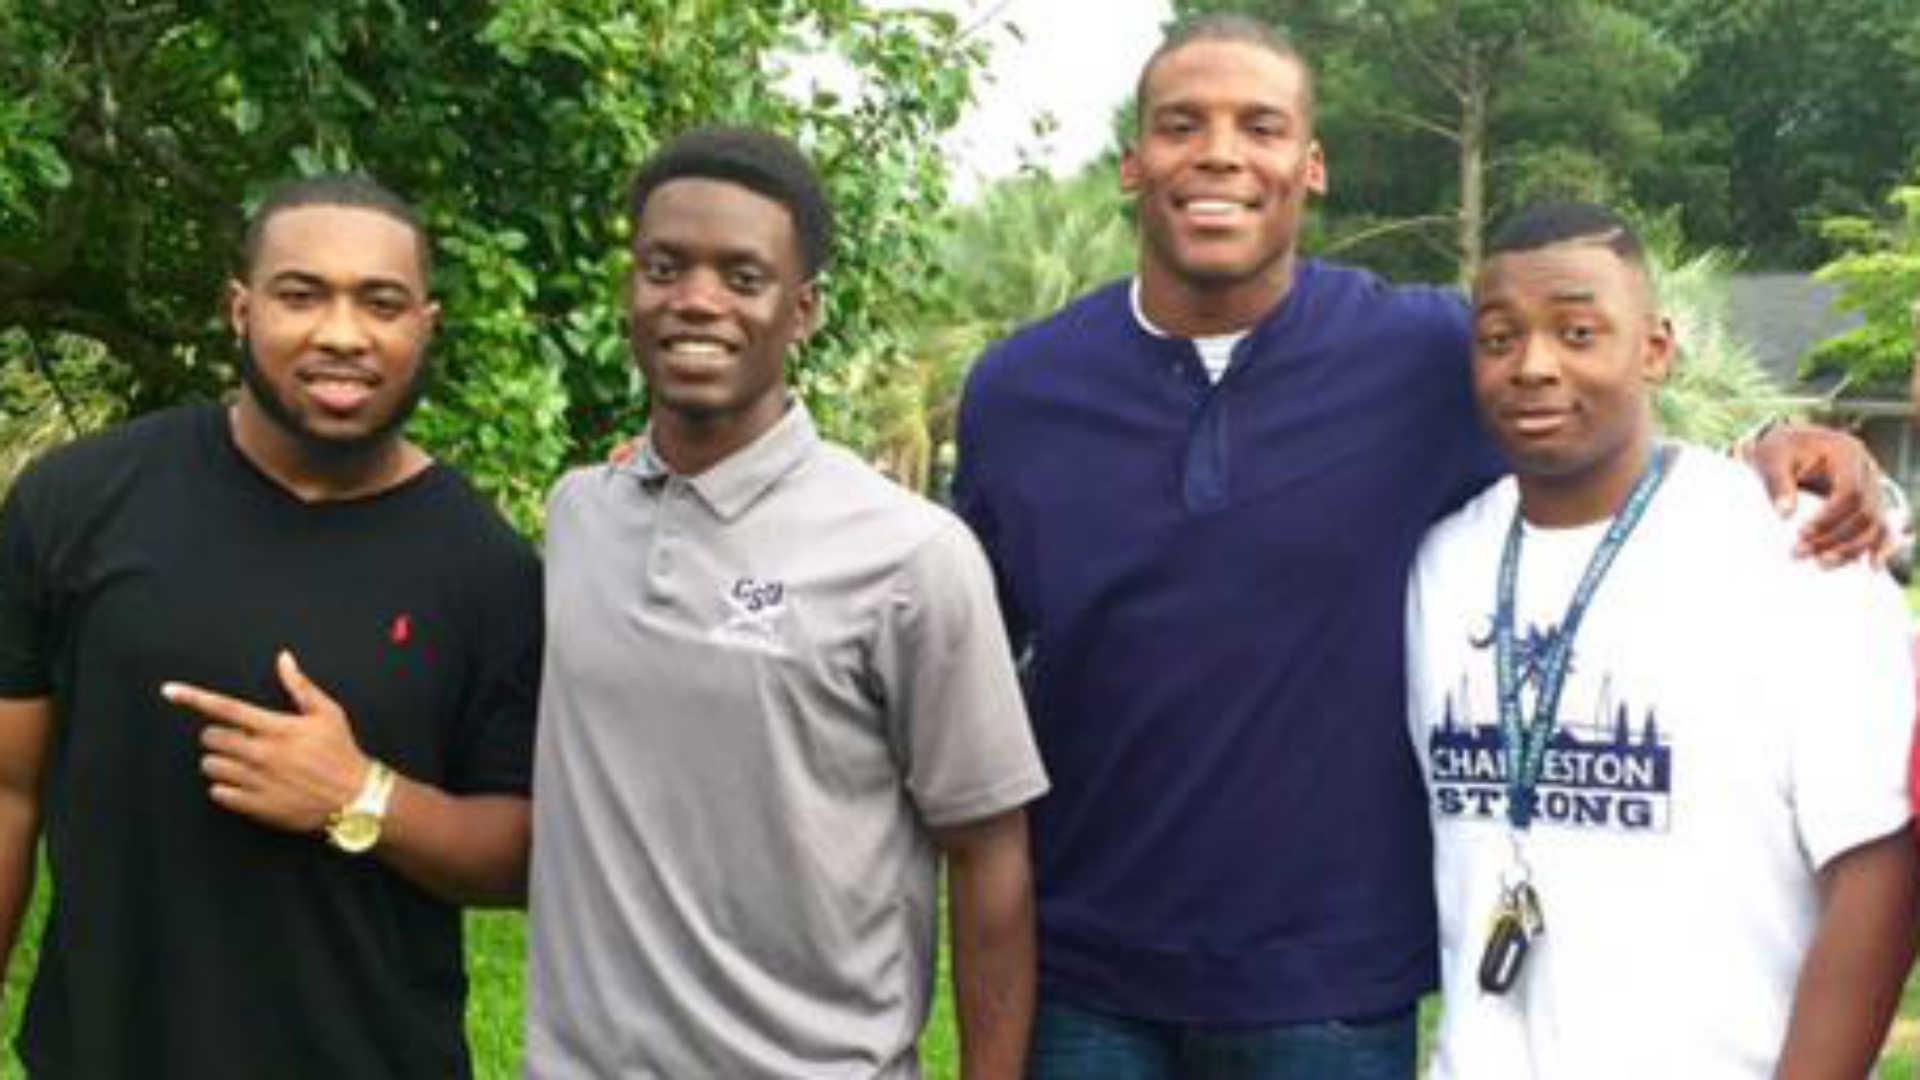 Cam Newton visits